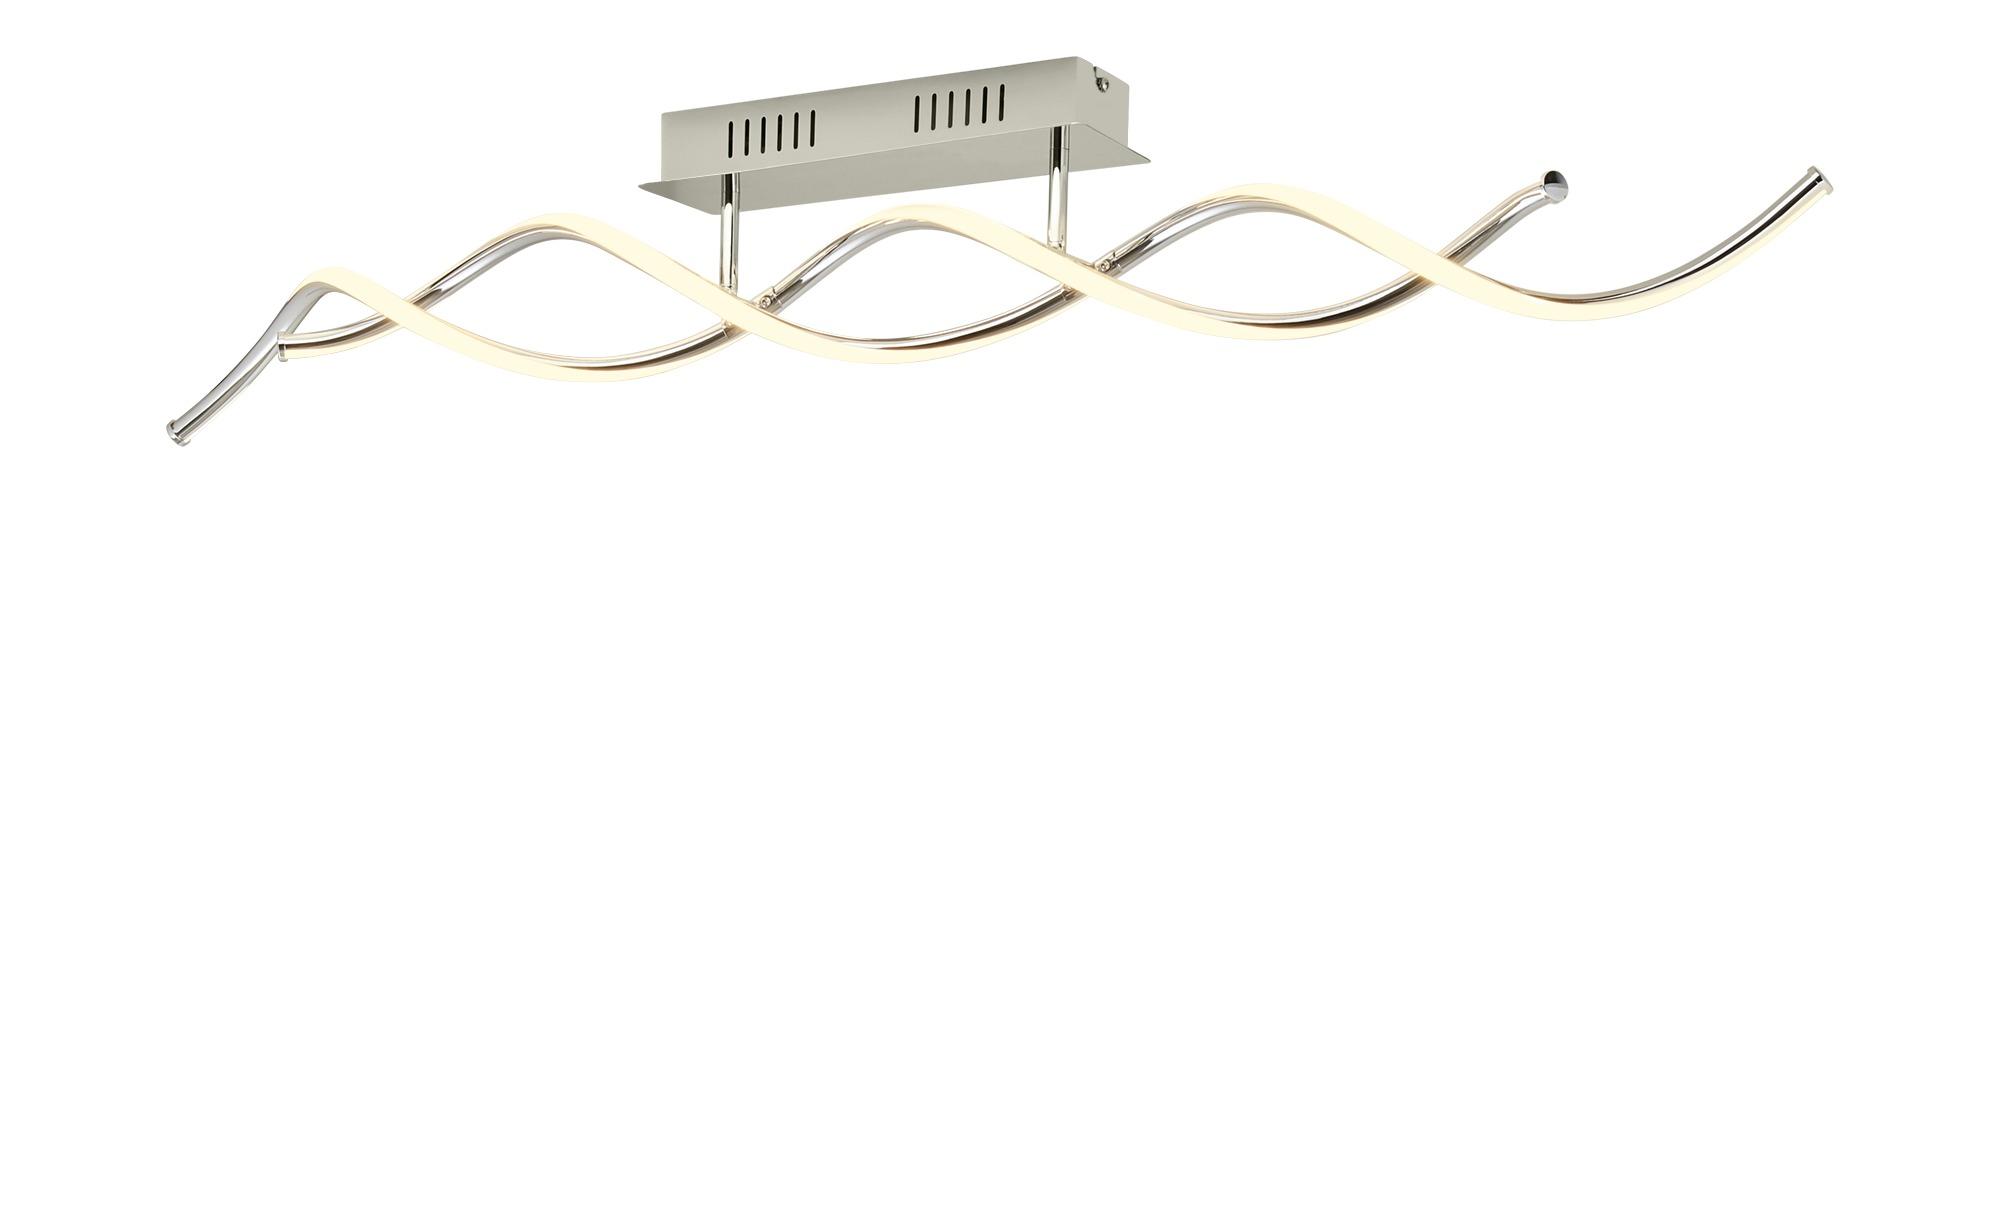 KHG LED-Deckenleuchte, 2-flammig ¦ silber ¦ Maße (cm): B: 8,5 H: 15 Lampen & Leuchten > Innenleuchten > Deckenleuchten - Höffner